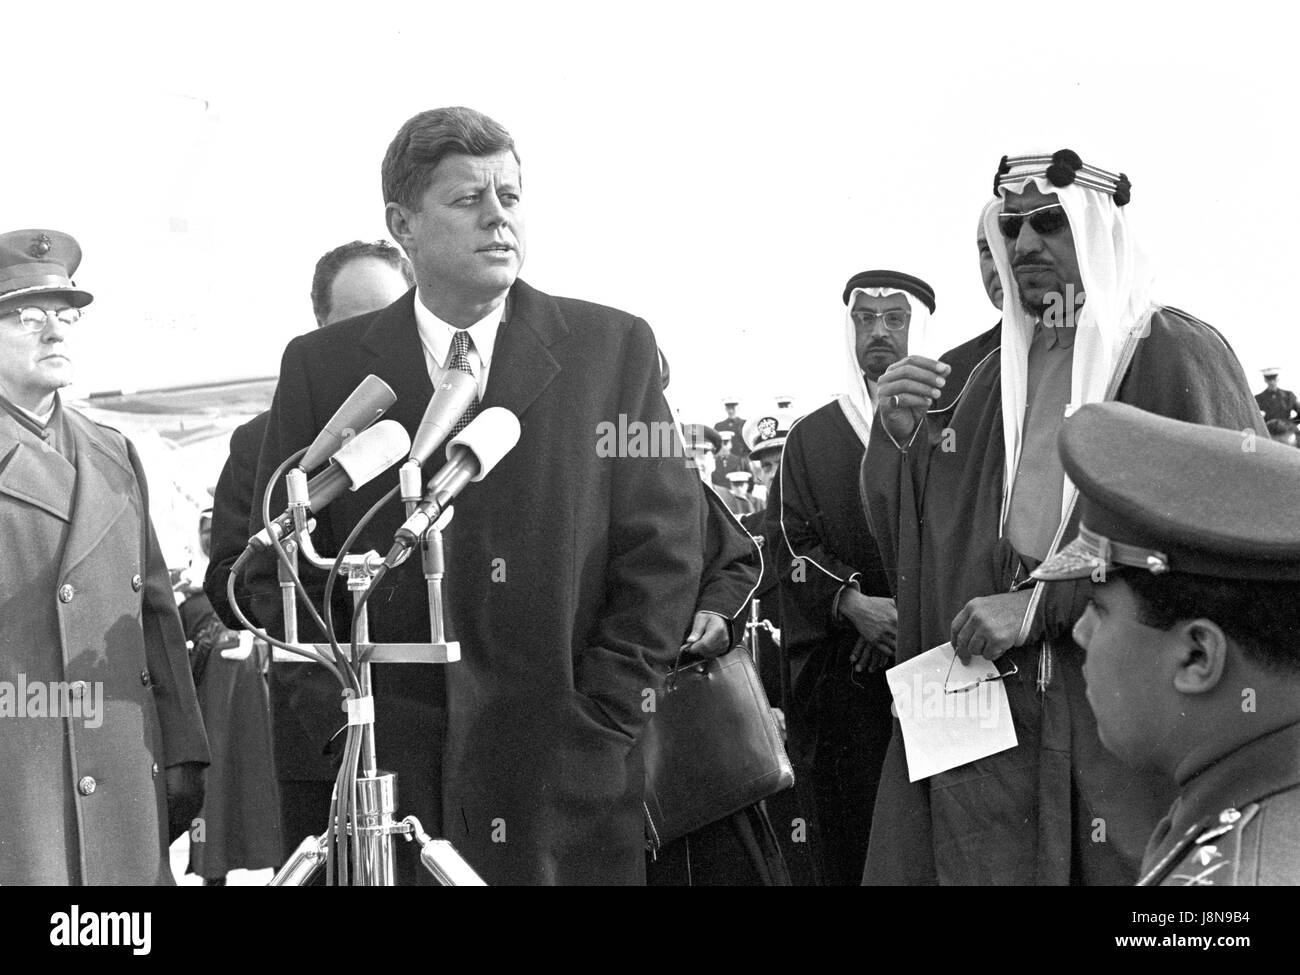 Founding King Abdulaziz Al-Saud and J. Kennedy 95